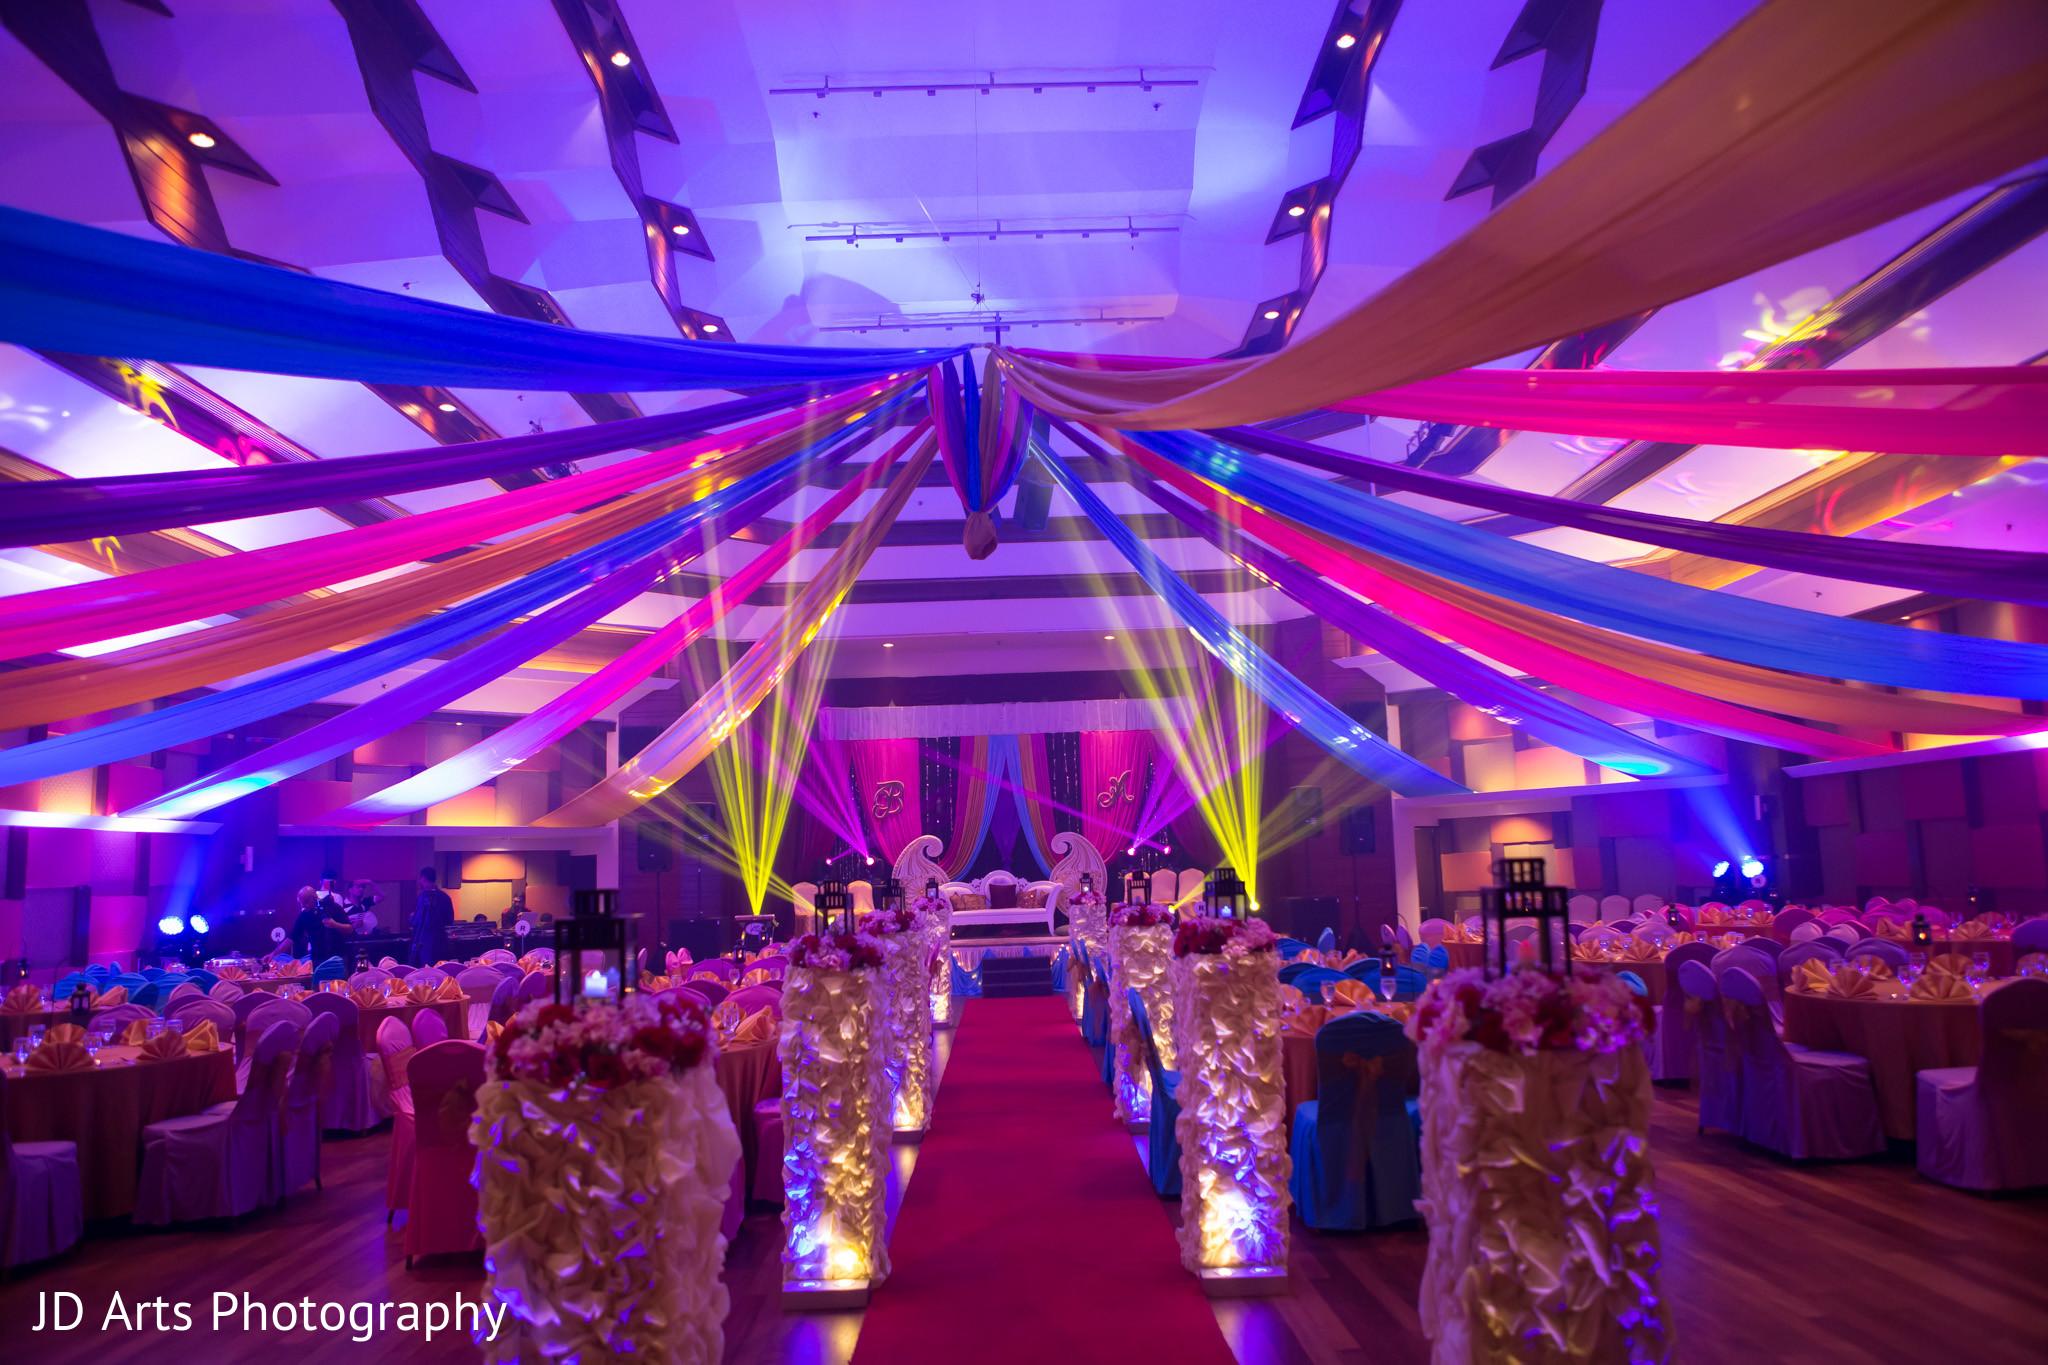 Sangeet in kuala lumpur malaysia indian wedding by jd arts sangeet in kuala lumpur malaysia indian wedding by jd arts photography maharani weddings junglespirit Images